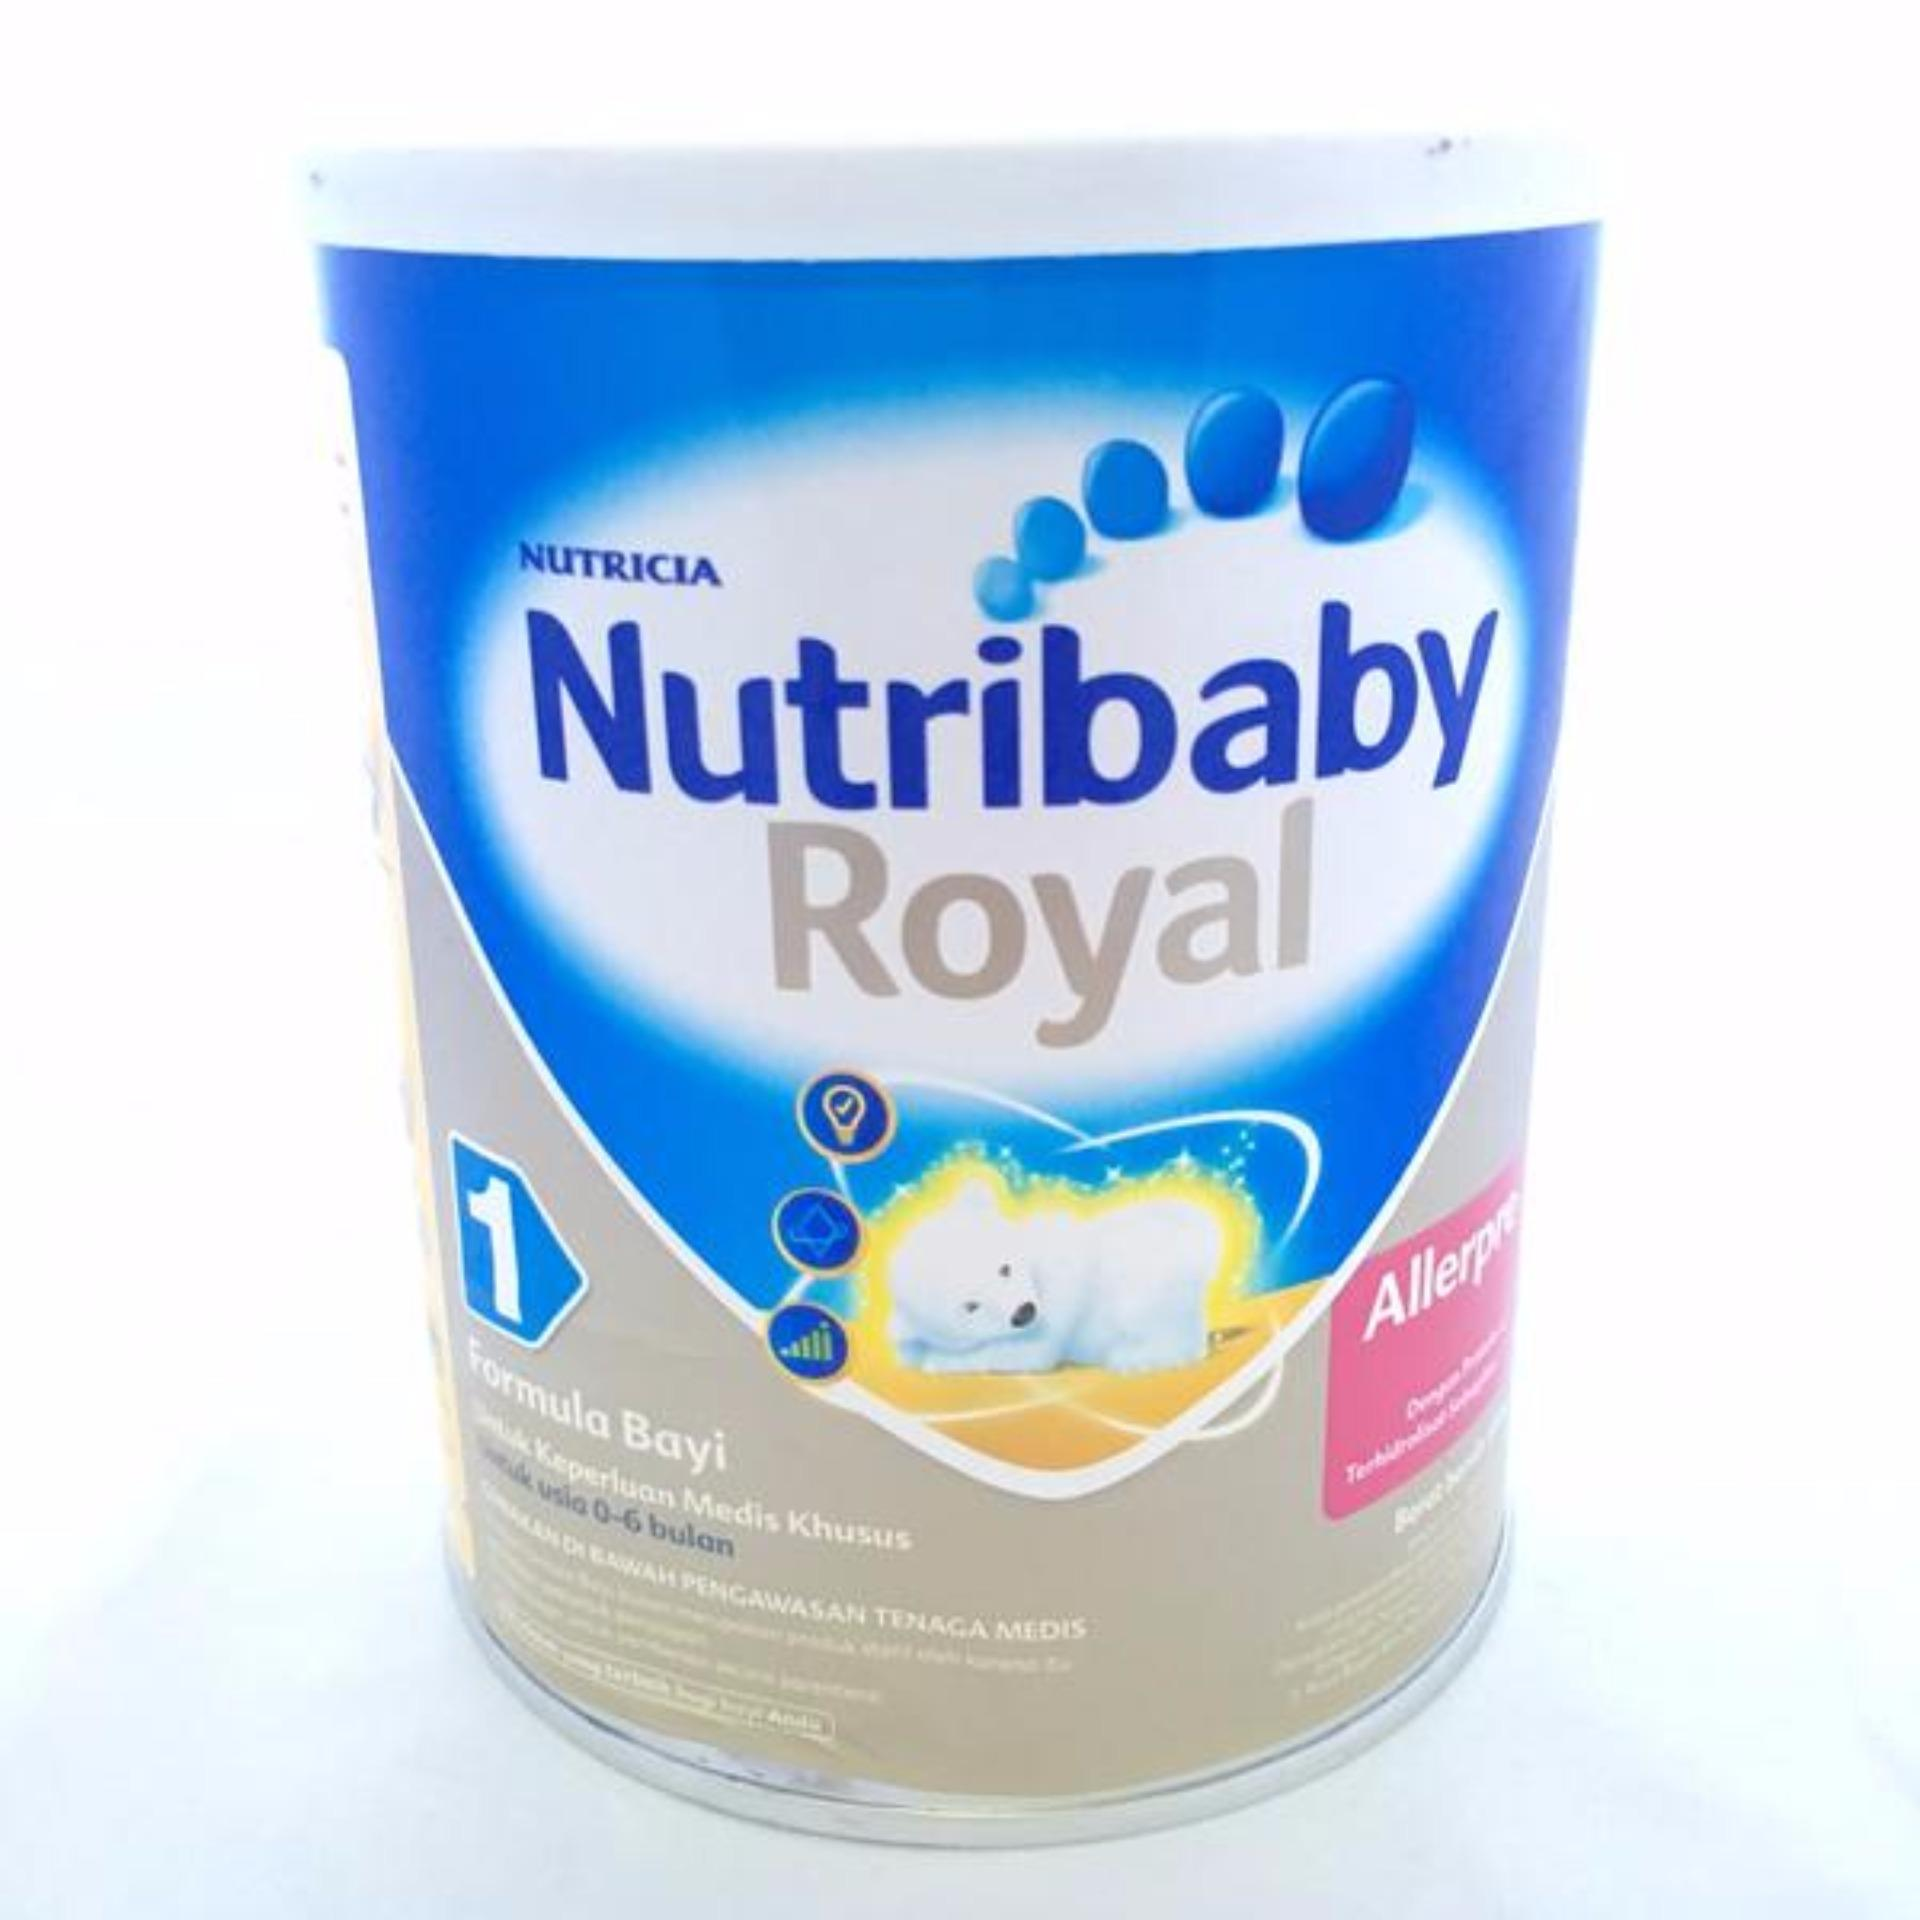 Jual Susu Formula Nutricia Termurah Bebelac 4 Vanilla Madu 400gr Nutribaby Royal Allerpre 1 400 Gr